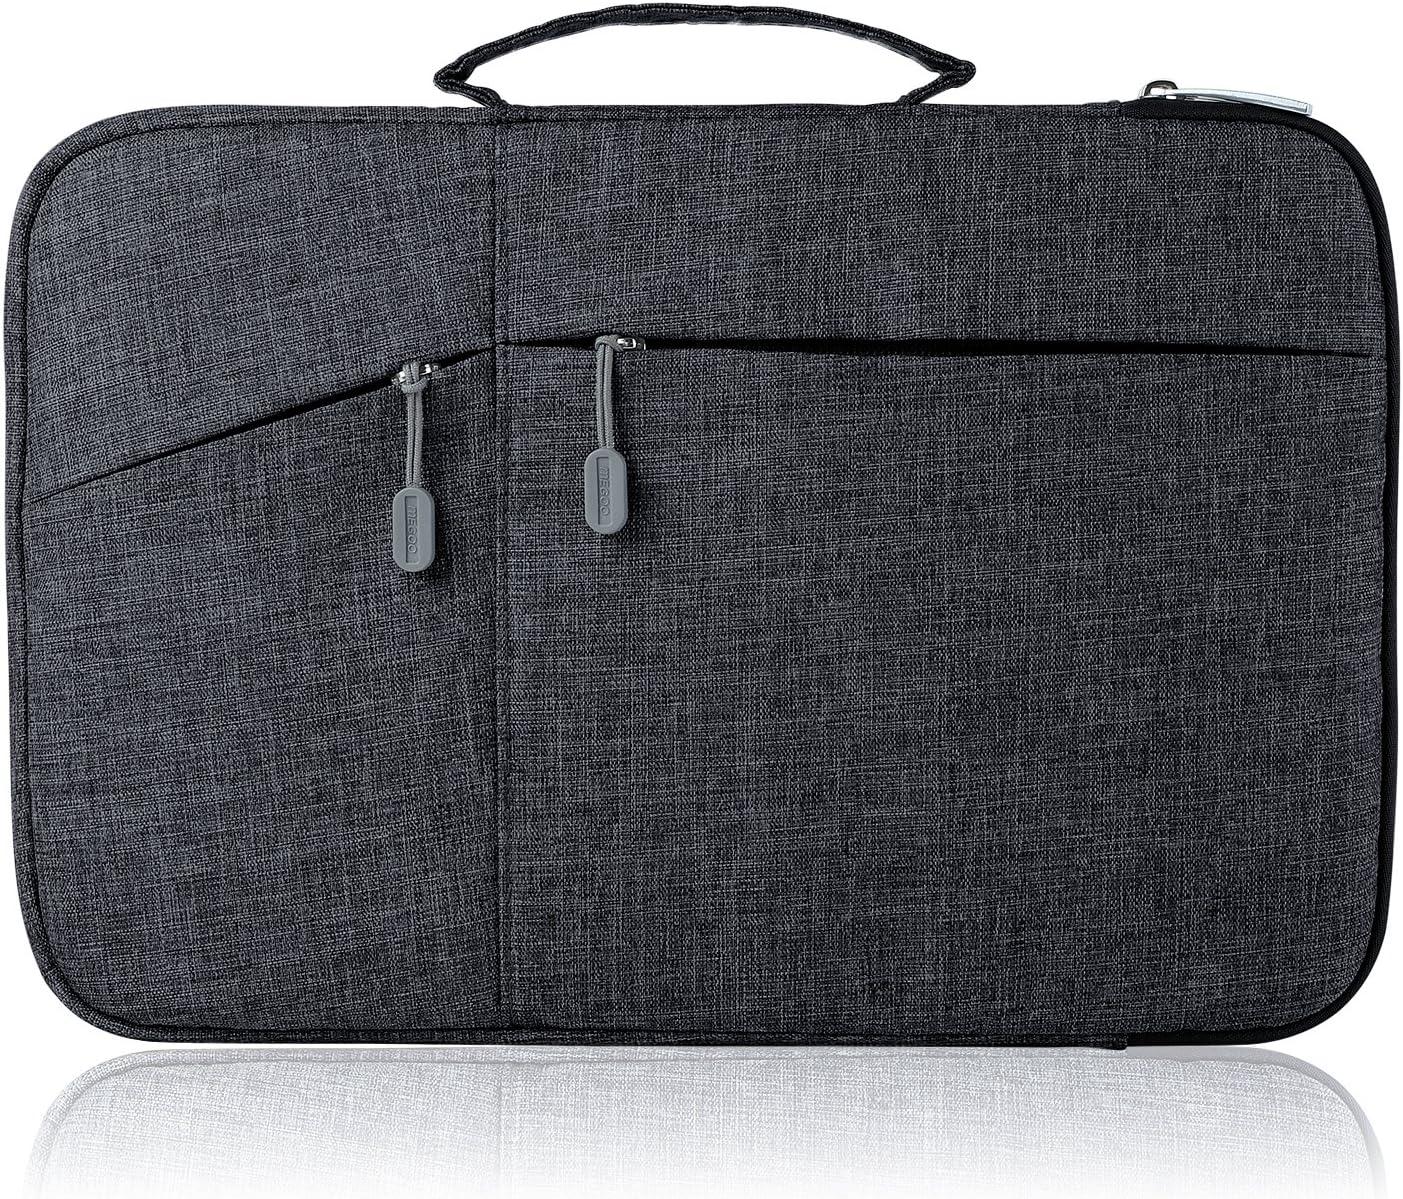 Megoo 12inch Sleeve Case for Microsoft Surface Pro X/7/6/5/4/3 12.3